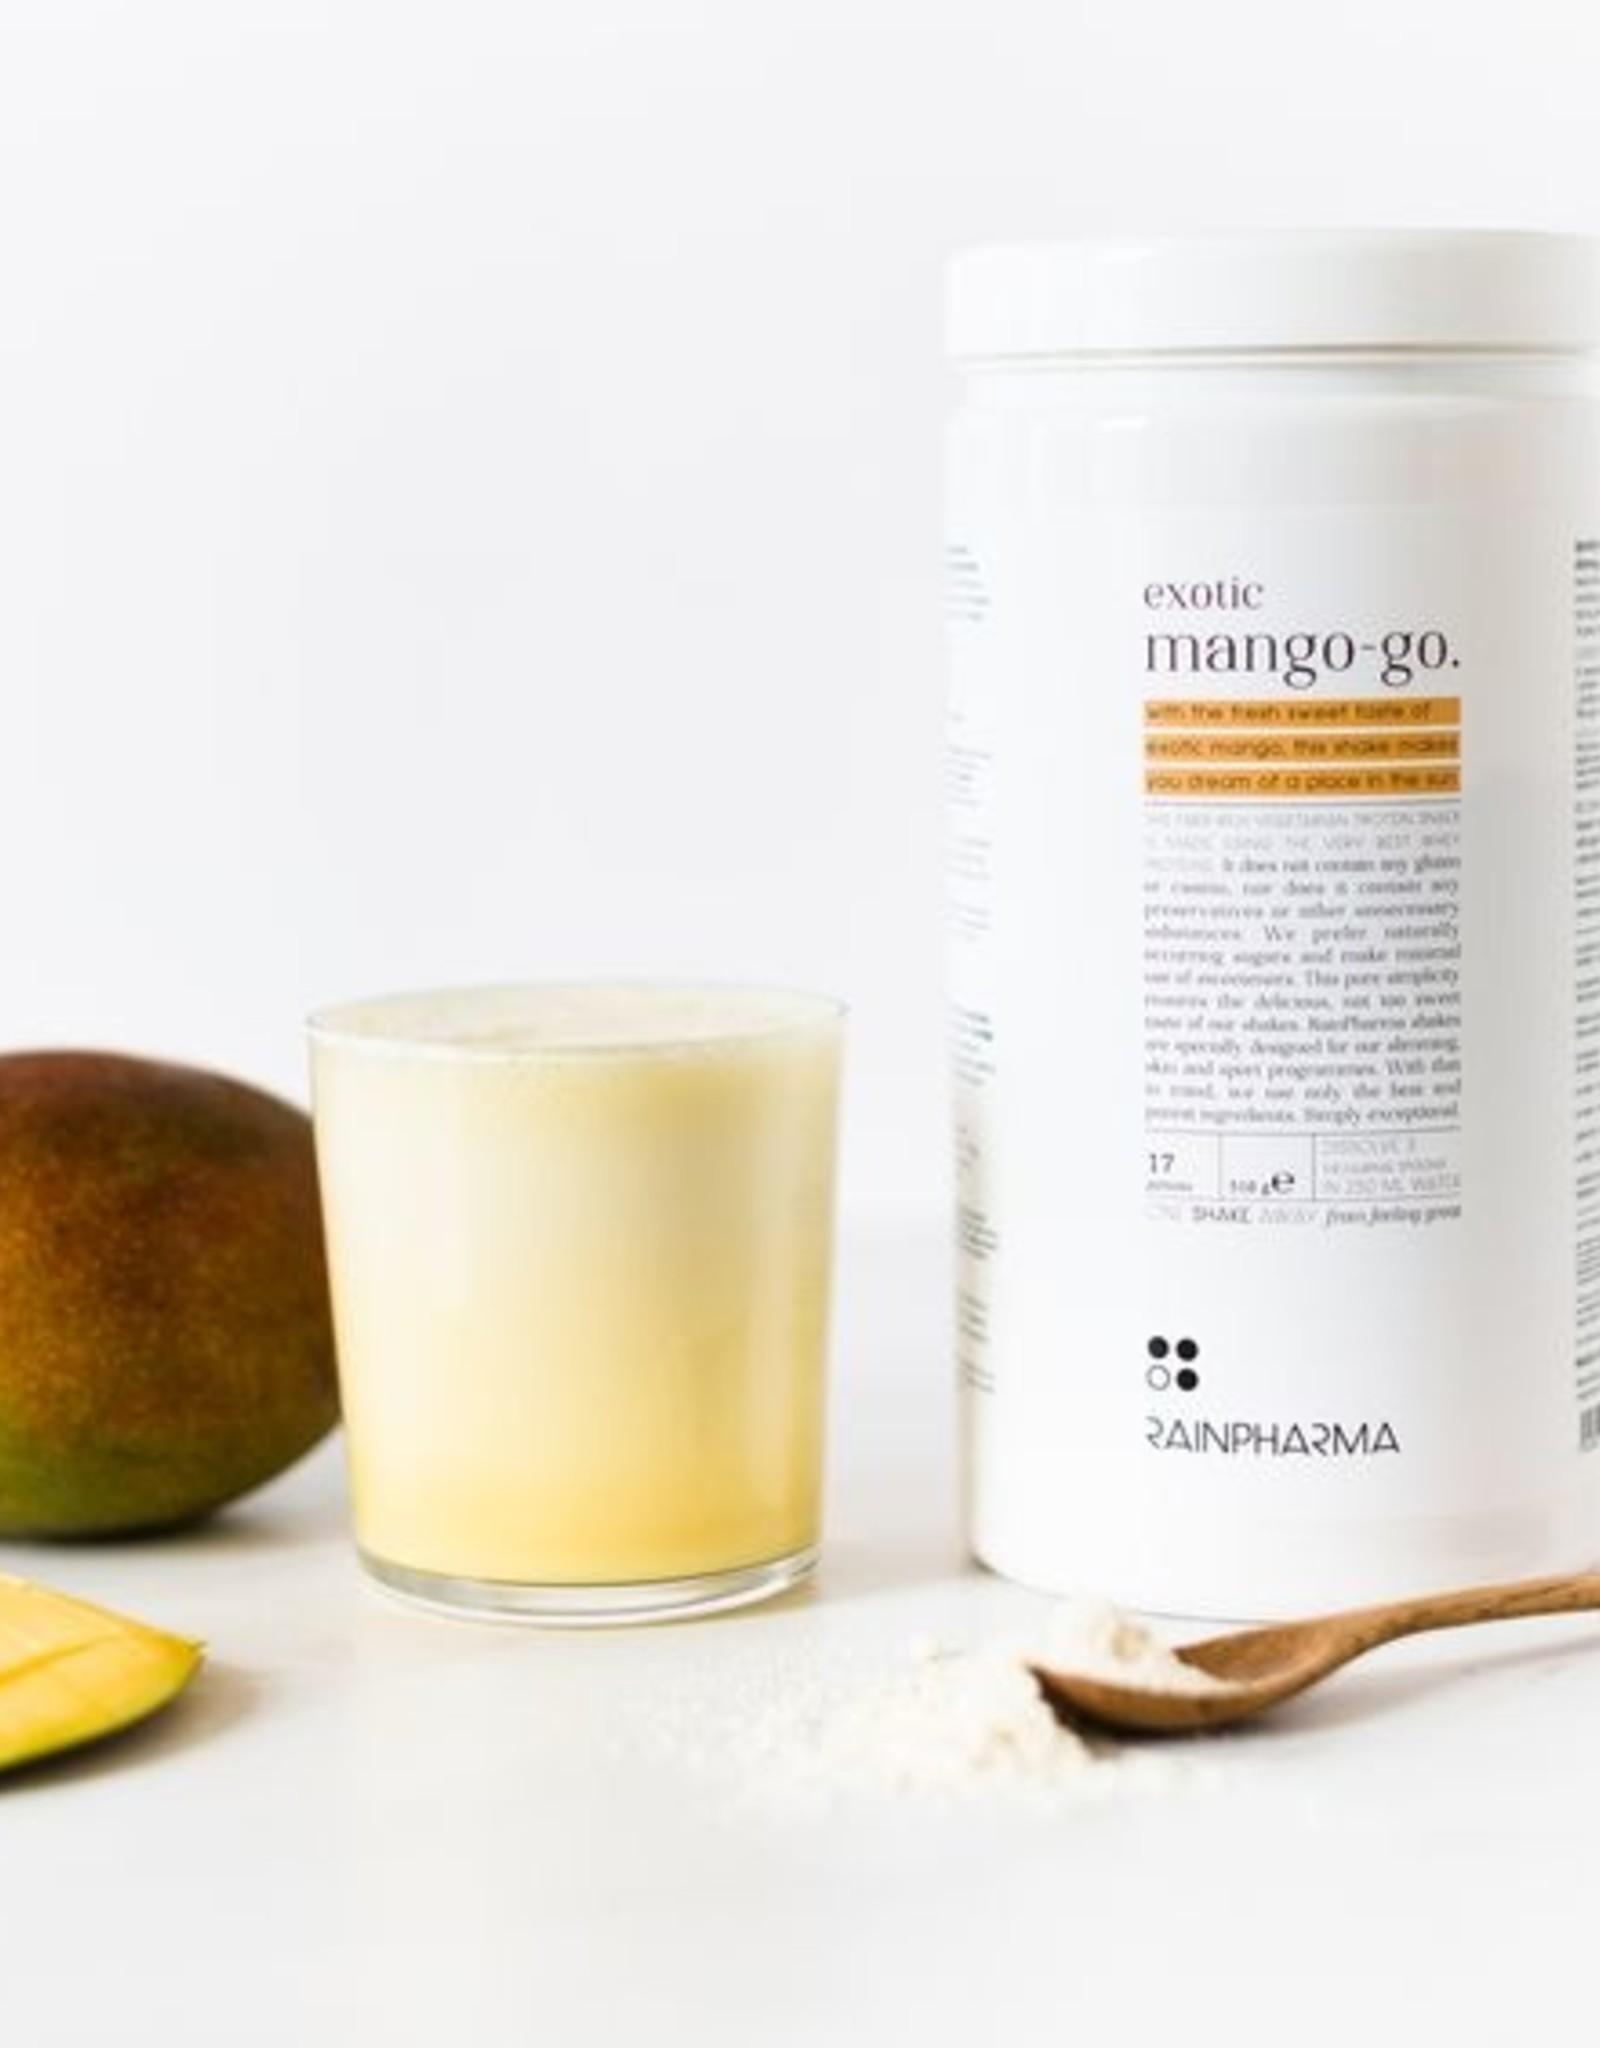 RainPharma Exotic Mango-go 510g - Rainpharma